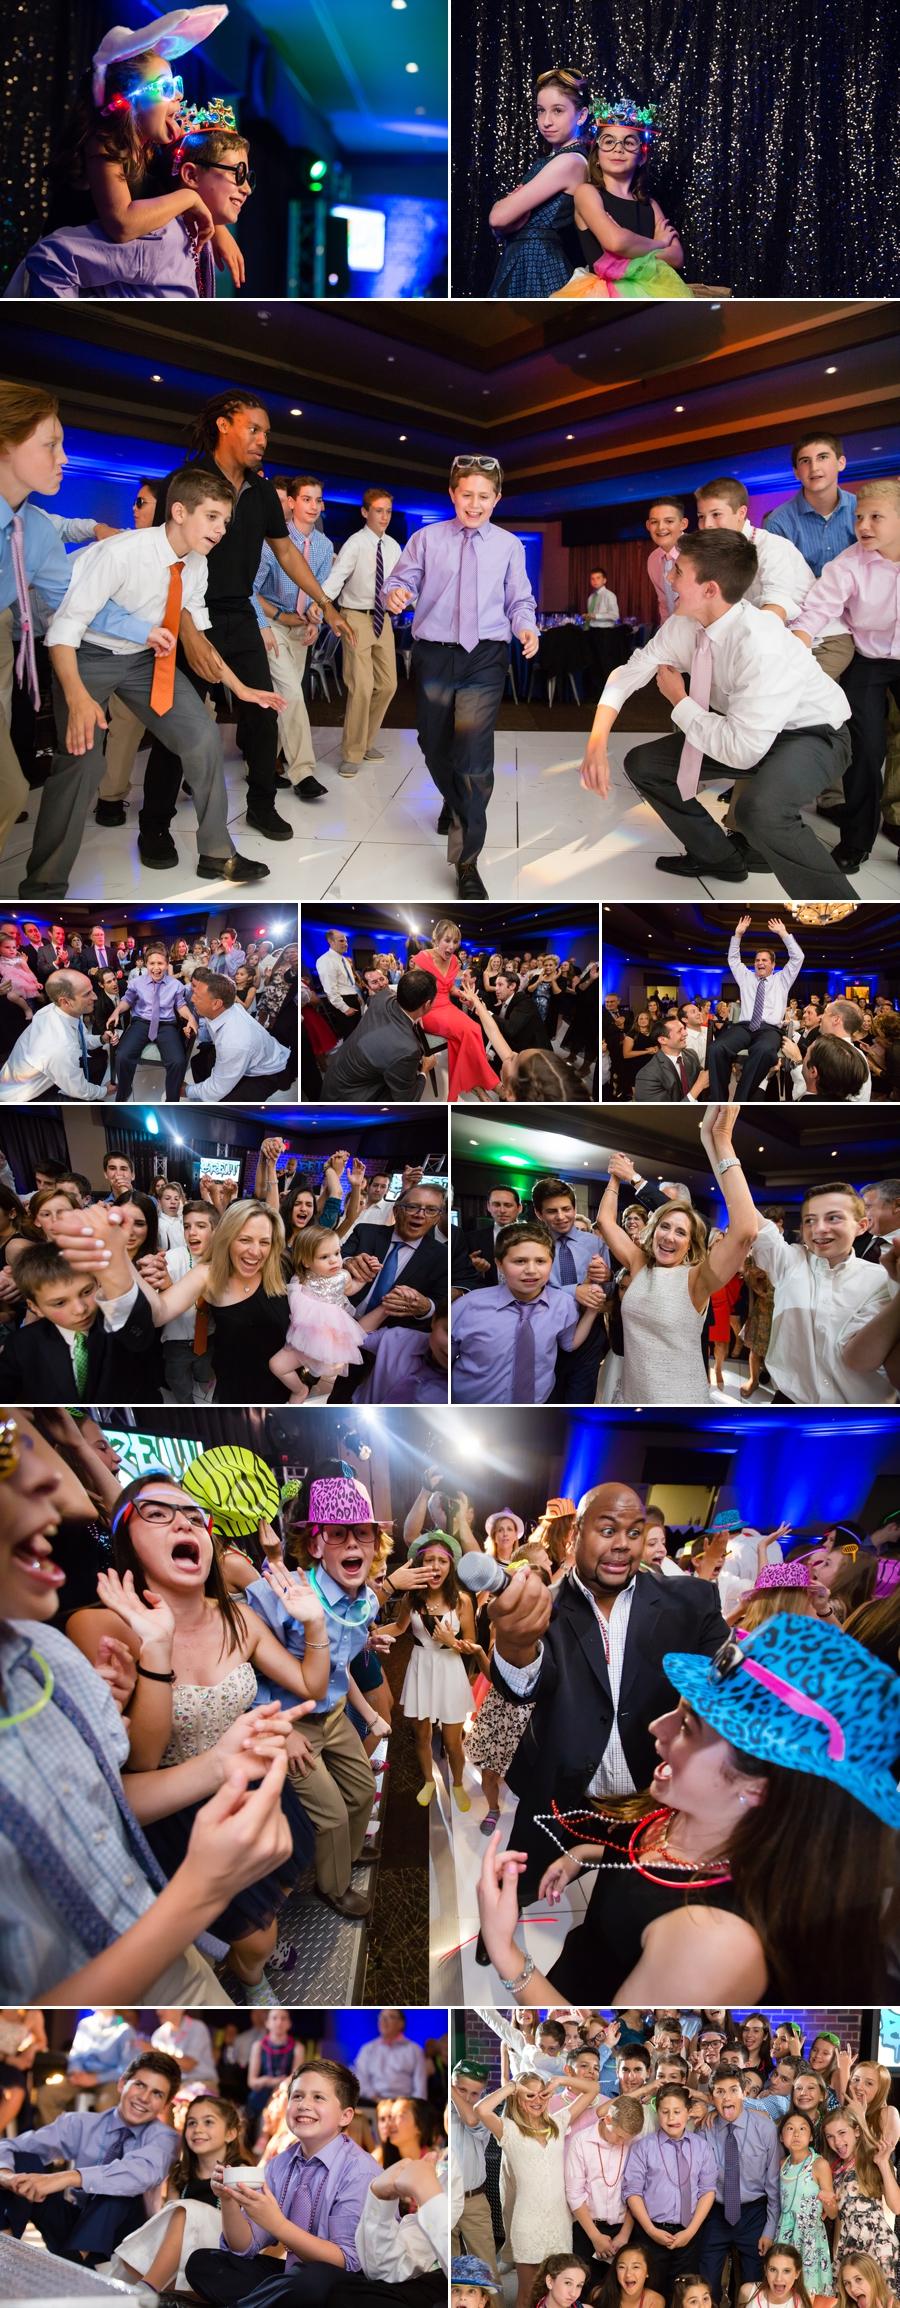 Bar Mitzvah dance